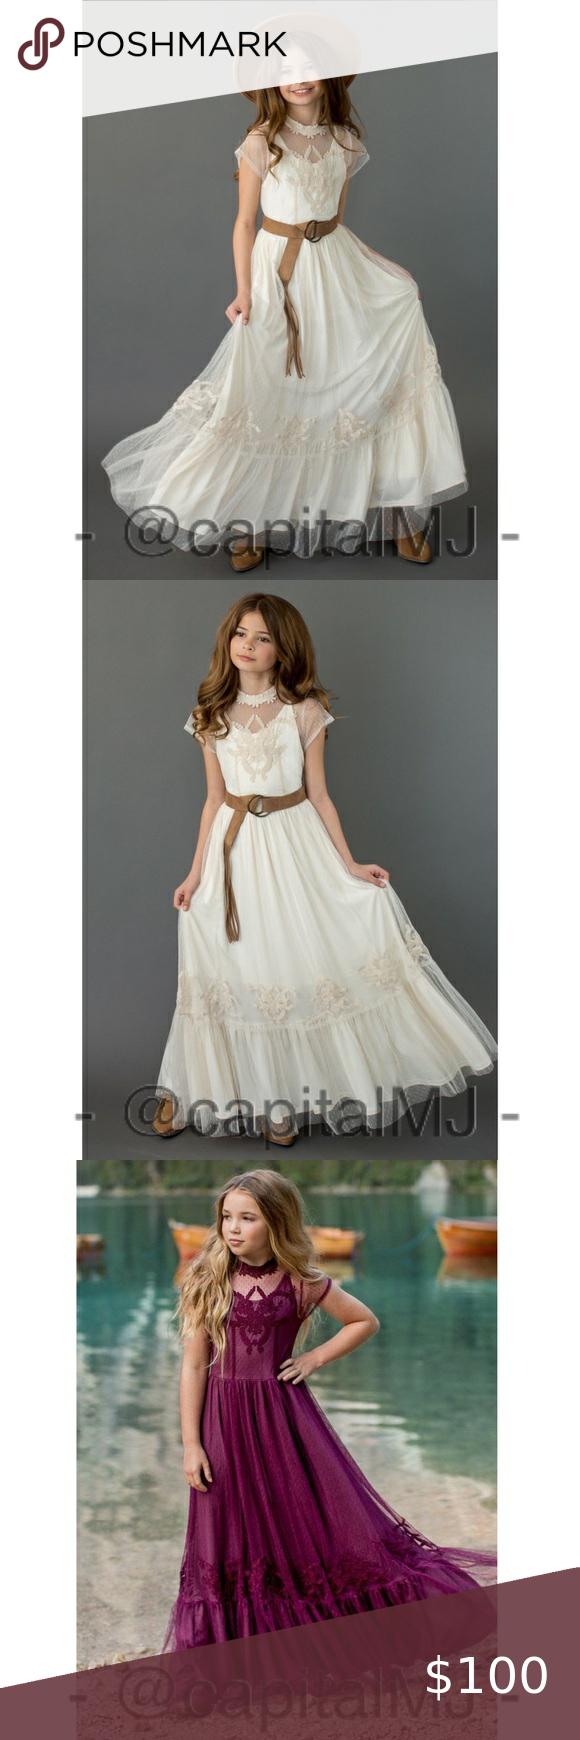 Jolie Maxi Dress In Cream Fall Pictures Joyfolie Dress Dresses Elegant Embroidery [ 1740 x 580 Pixel ]